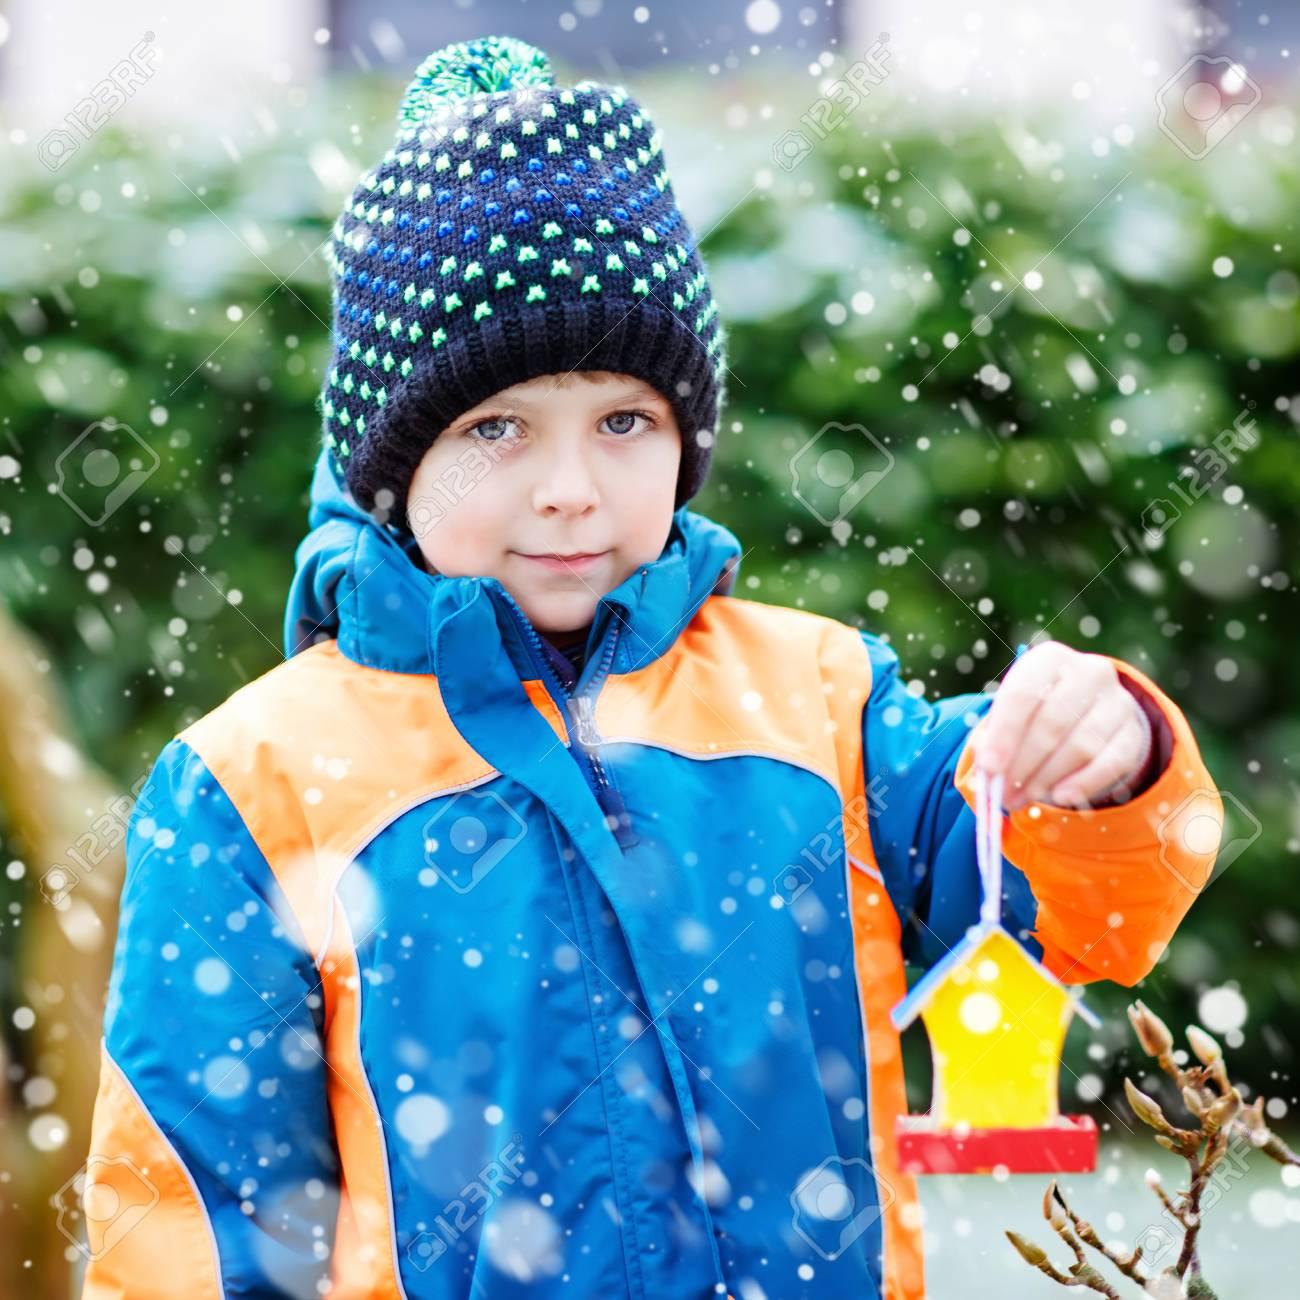 Stupendous Little Kid Boy Hanging Bird House On Tree For Feeding In Winter Download Free Architecture Designs Scobabritishbridgeorg